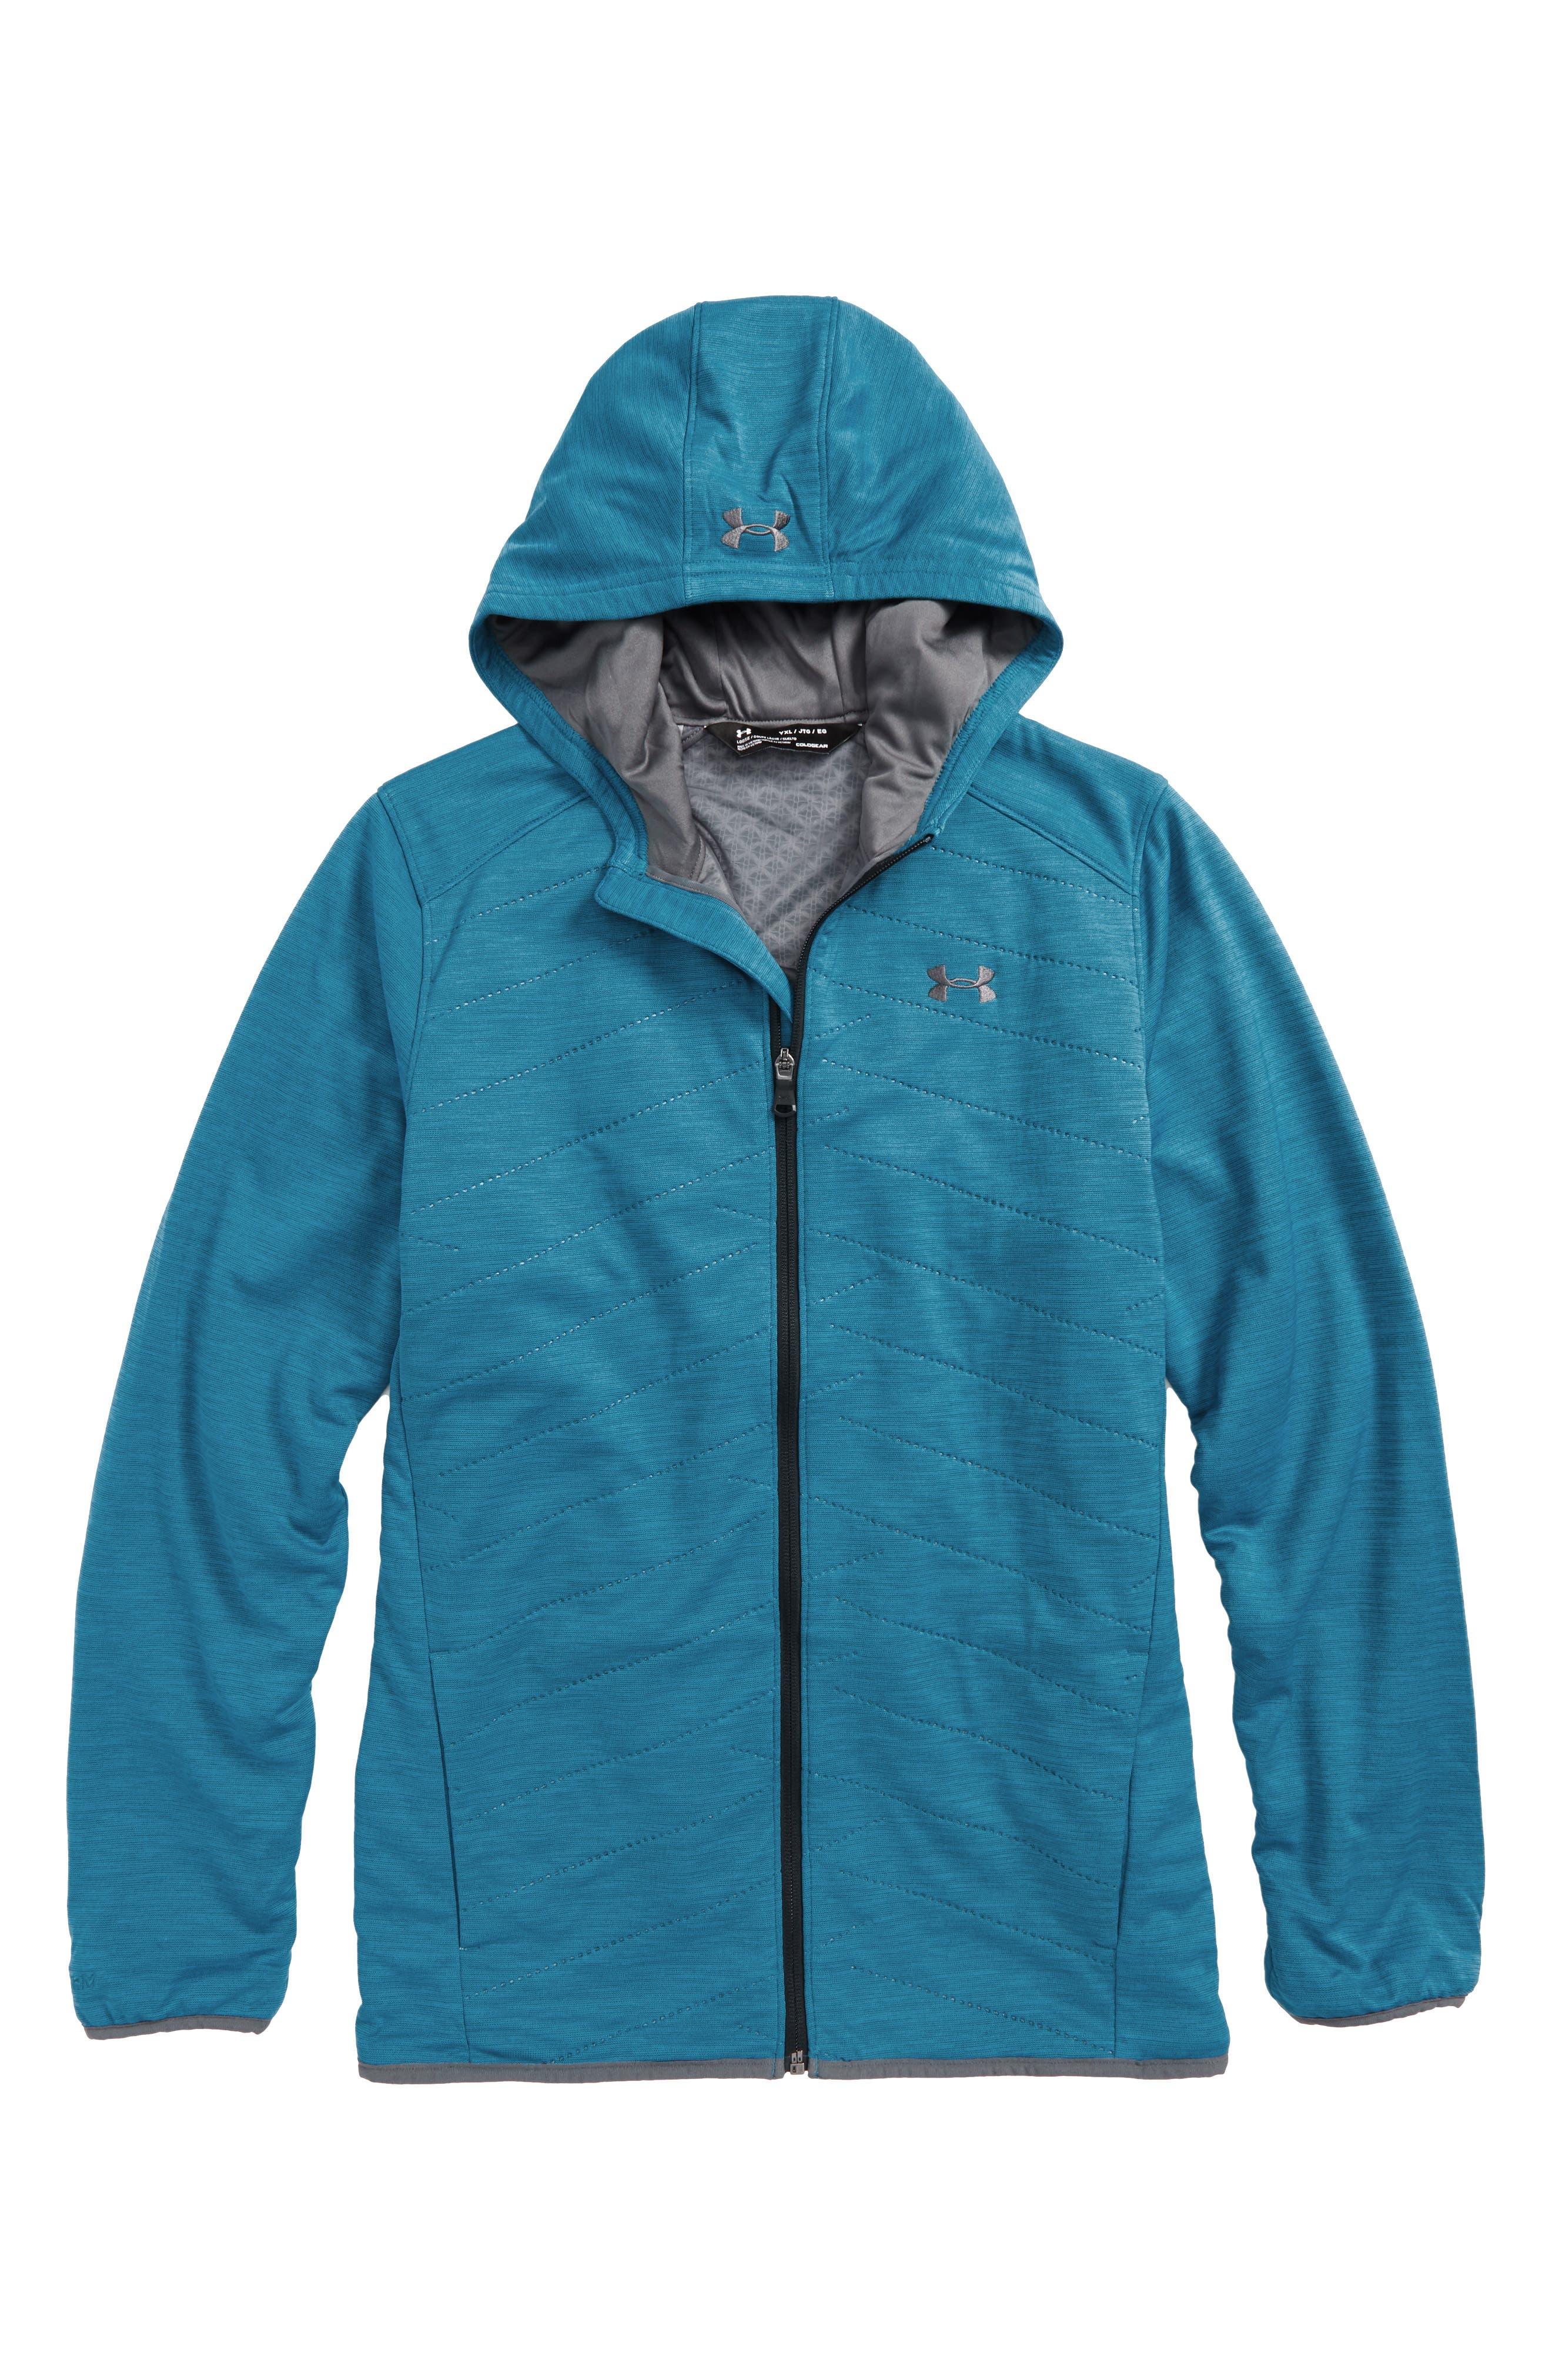 ColdGear<sup>®</sup> Reactor Hybrid Hooded Jacket,                         Main,                         color, Bayou Blue/ Rhino Gray